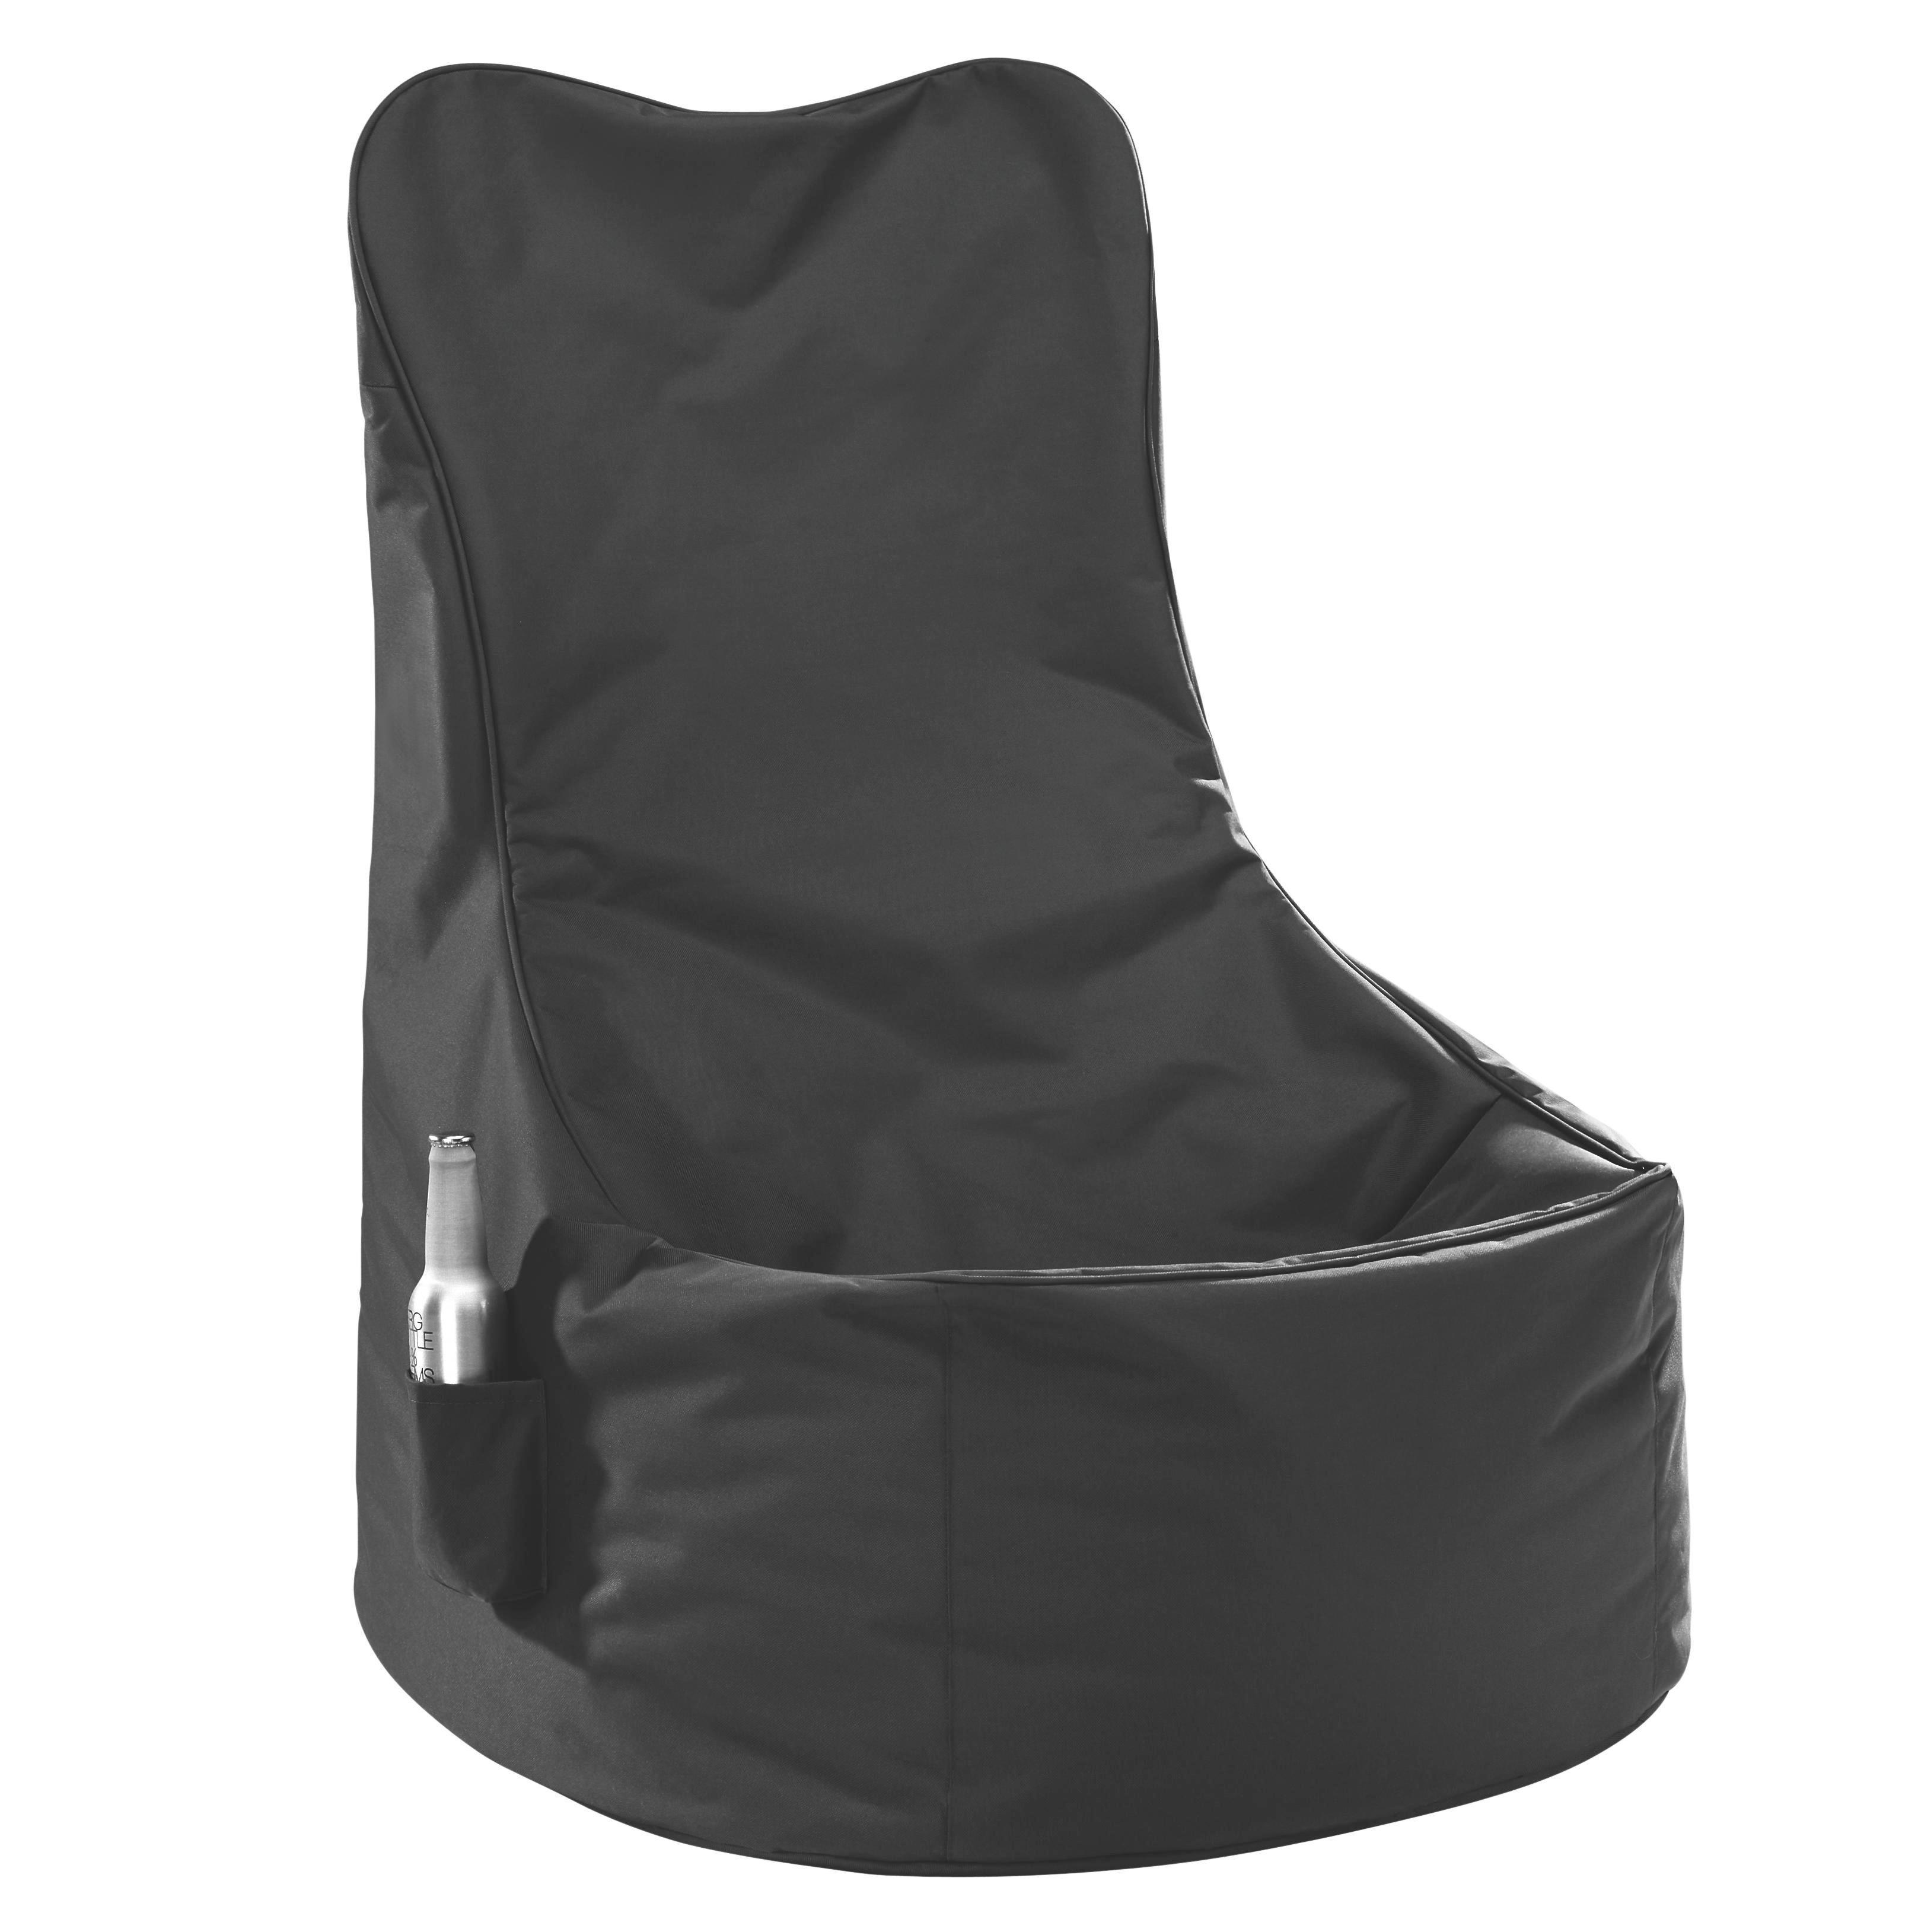 sitzscke kaufen full size of sofa groe gemtliche sofas bergroe tiefe couch billige sitzscke. Black Bedroom Furniture Sets. Home Design Ideas